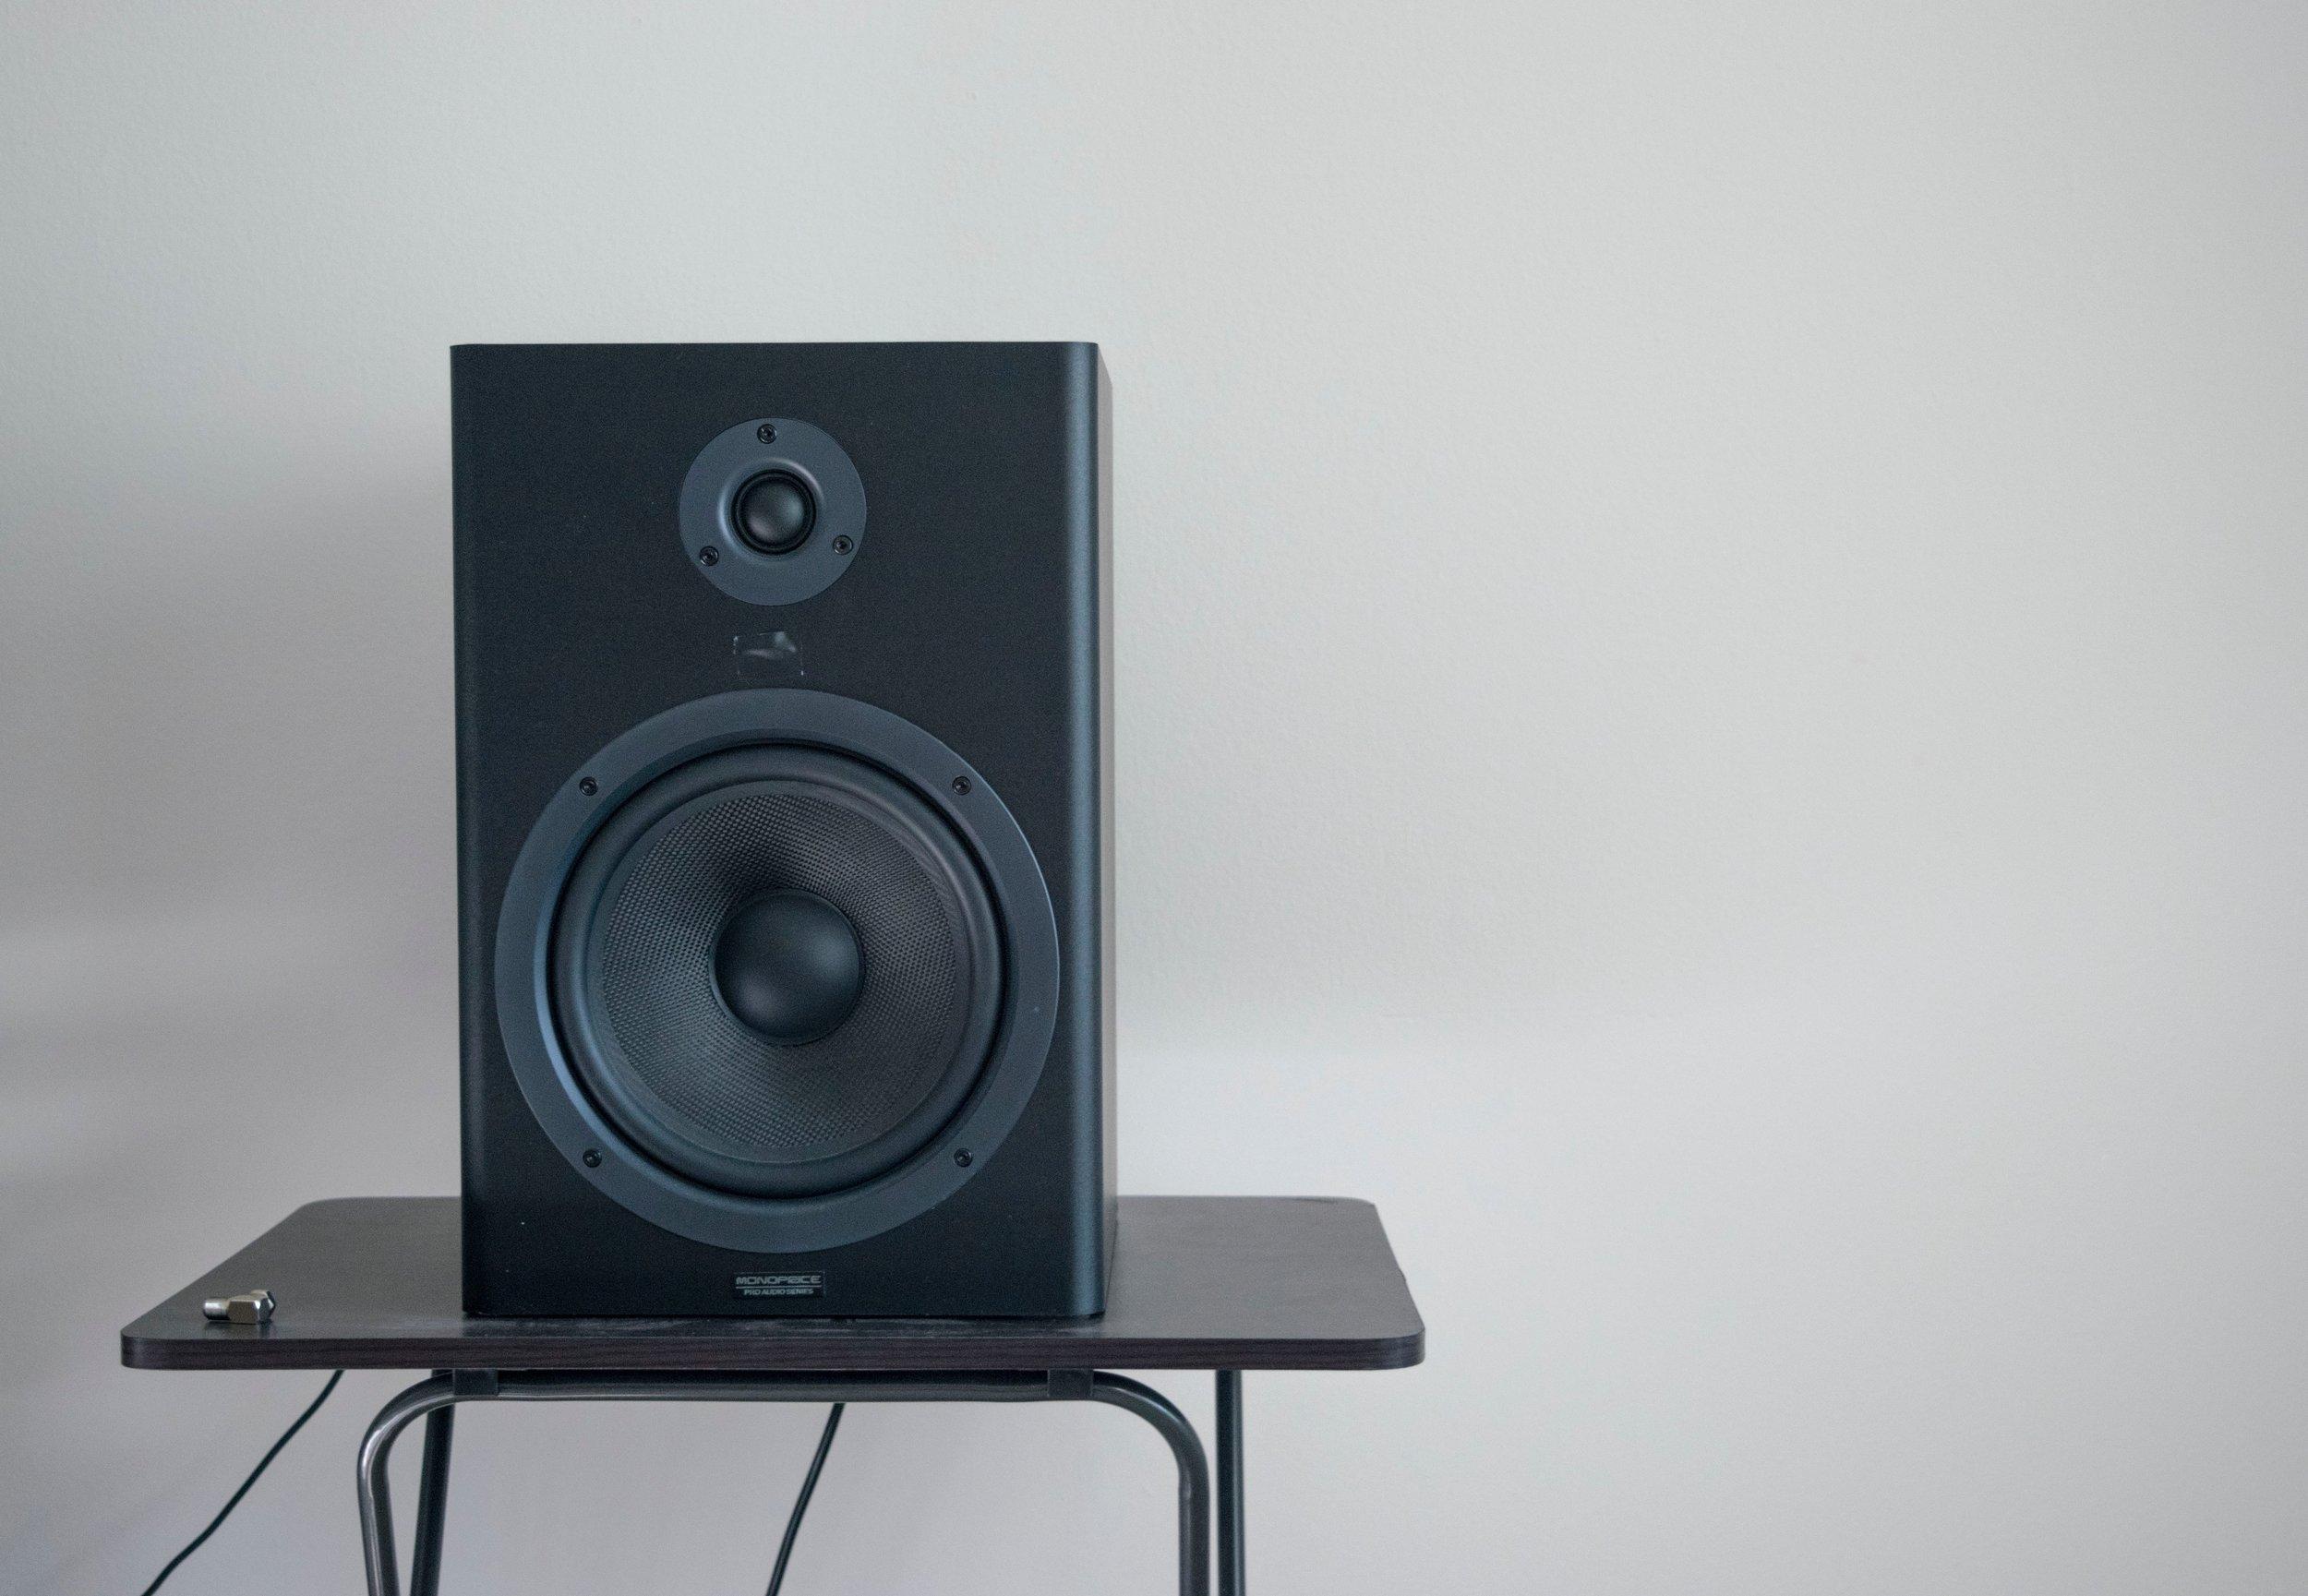 Audio Equipment - Coming Soon